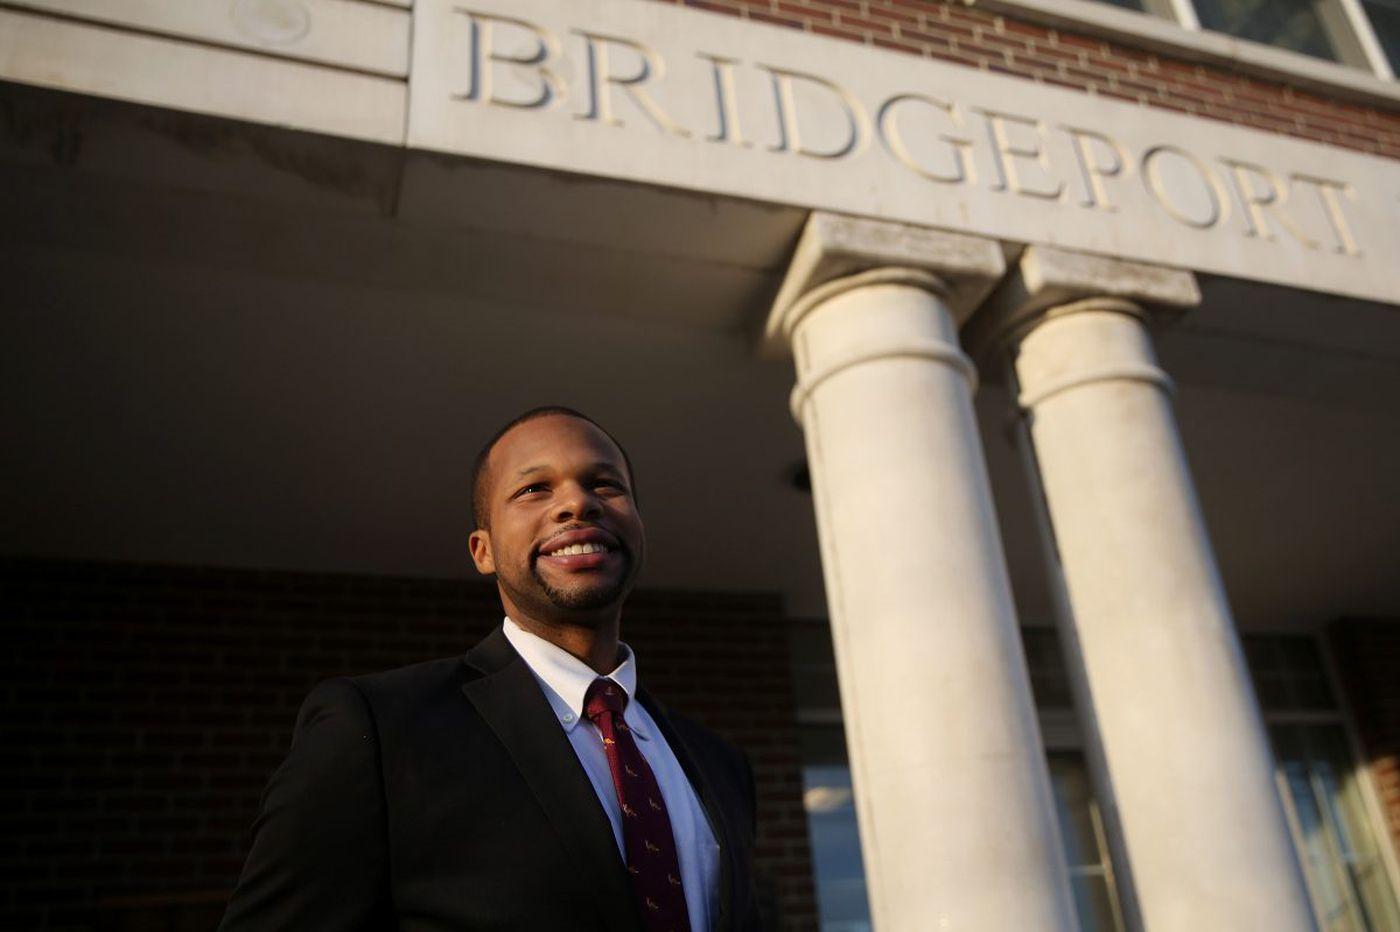 Can borough pride propel Bridgeport's long-awaited transformation?